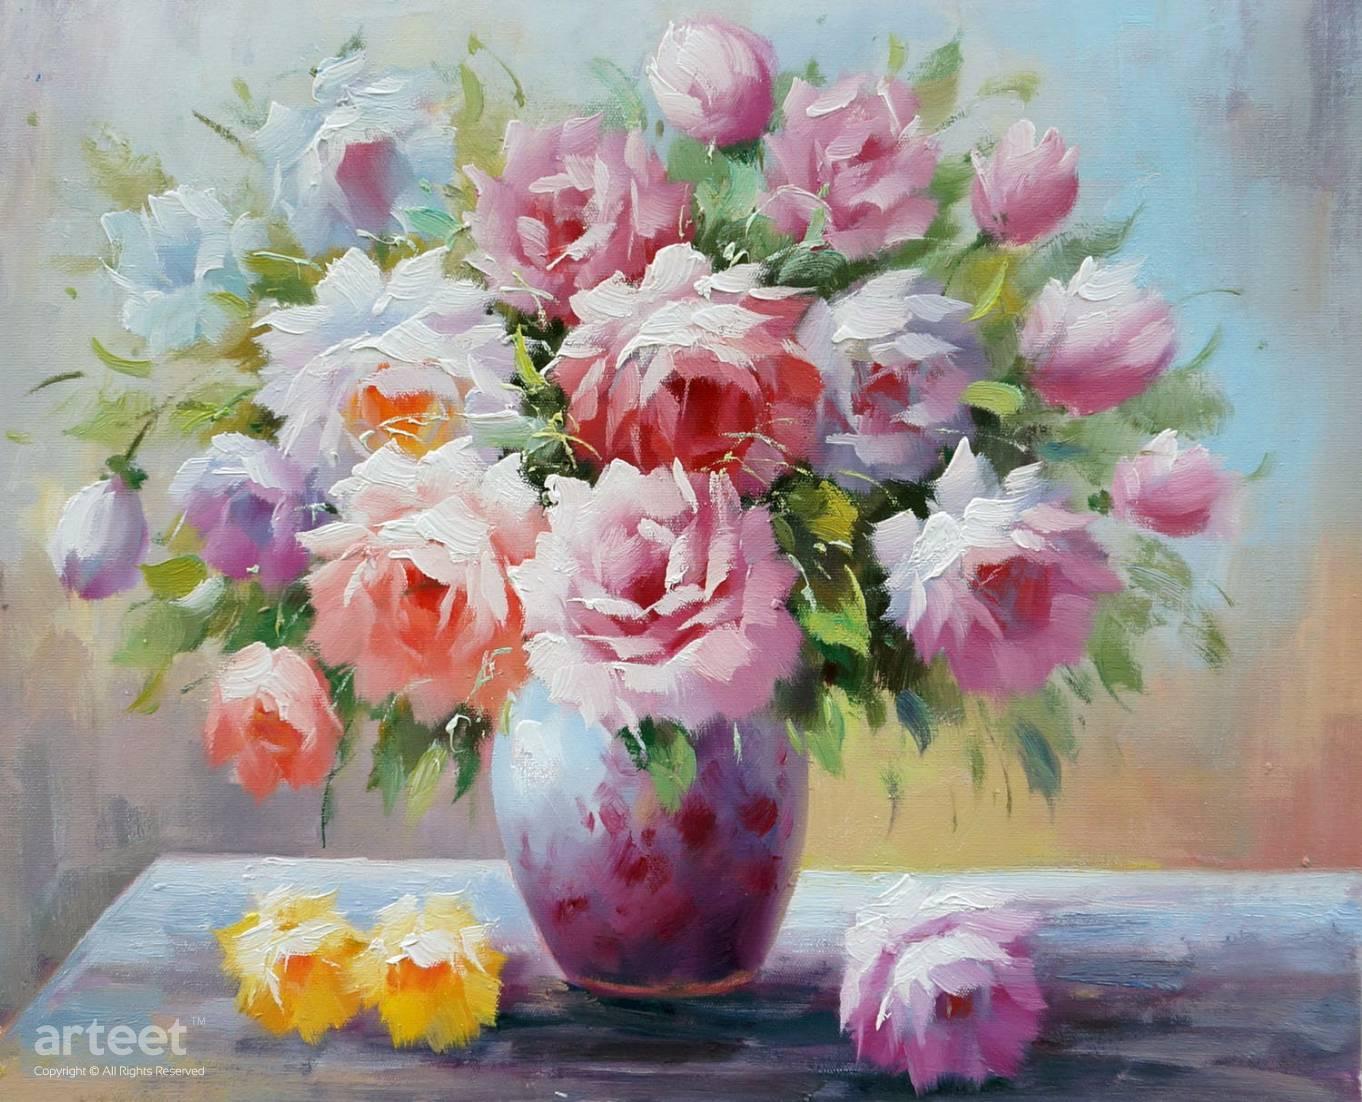 Pink Lady Art Paintings For Sale Arteet